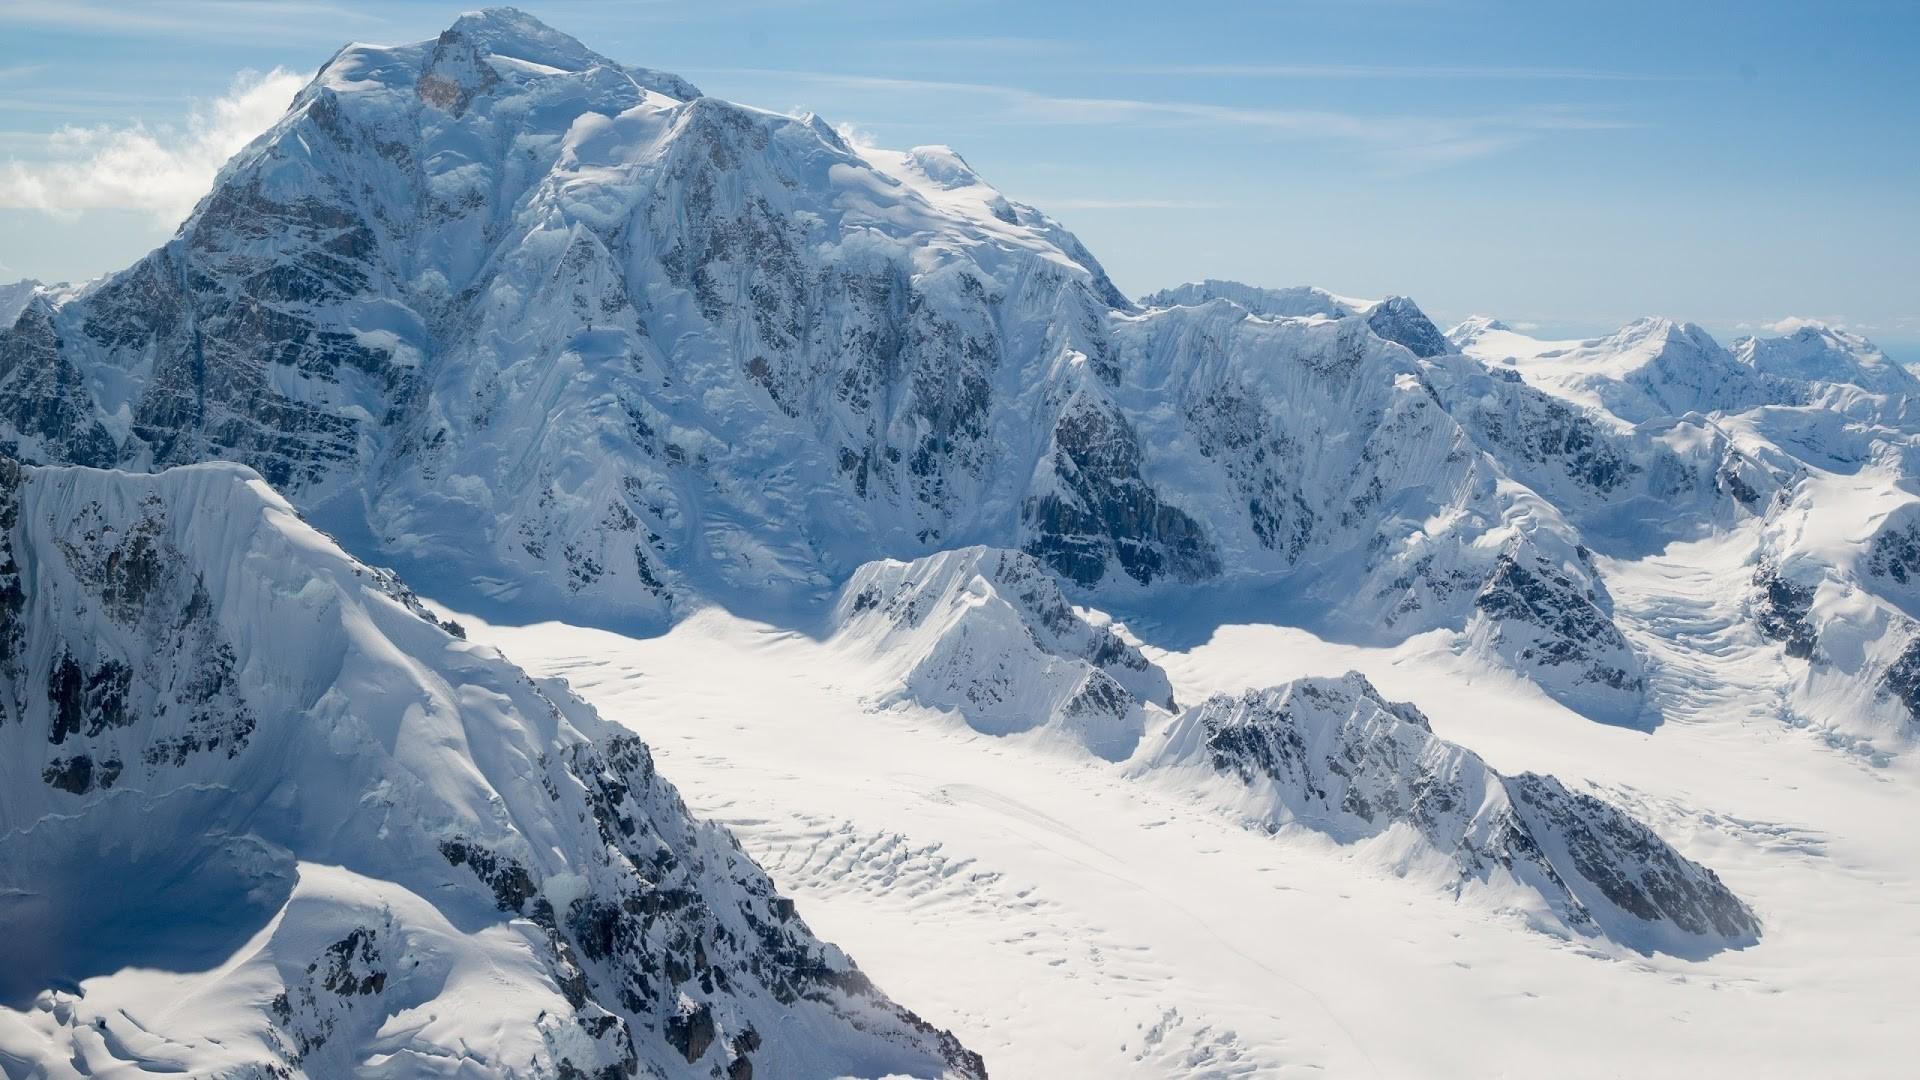 Snow Mountain wallpaper photo hd